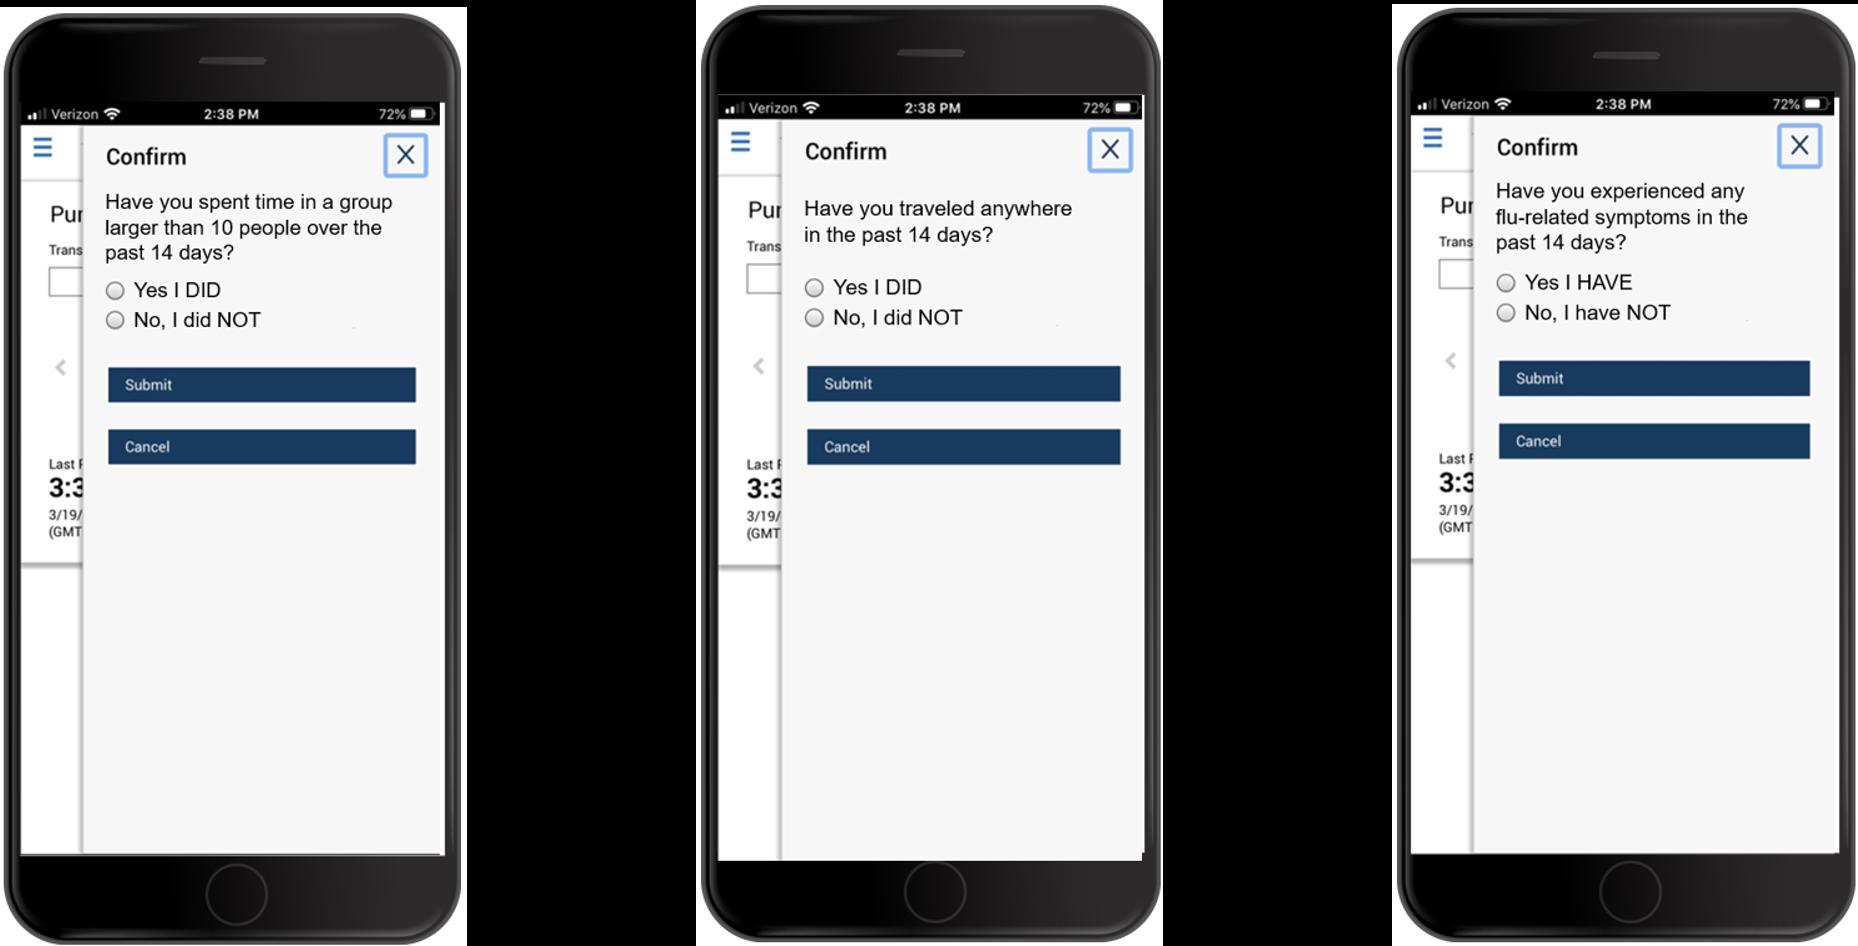 Mobile Attestation questions screenshots